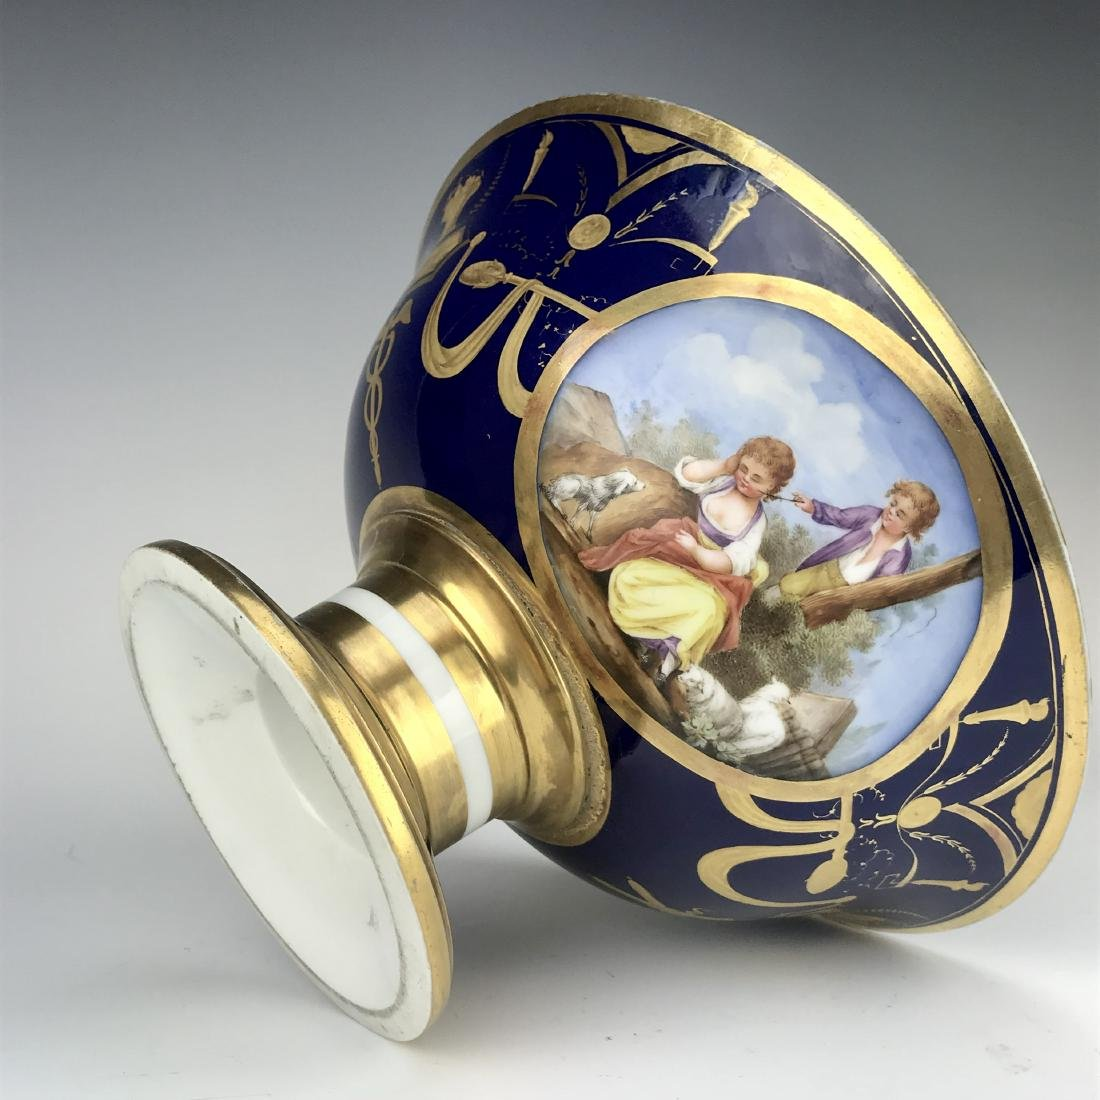 19th C. French Sevres Porcelain Centerpiece - 4